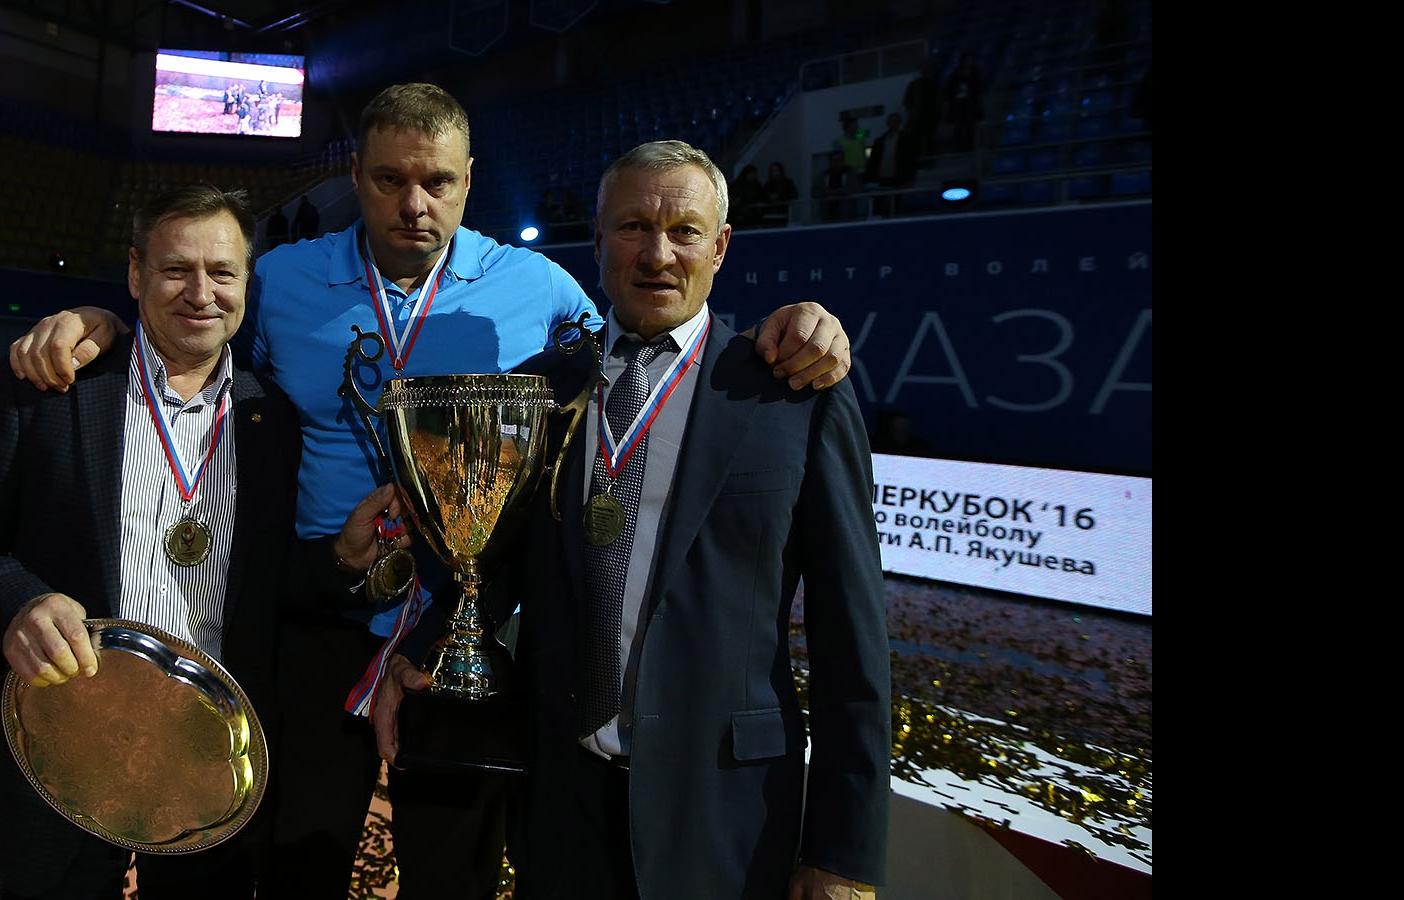 Ринат Багаутдинов, Владимир Алекно и Ильхам Рахматуллин